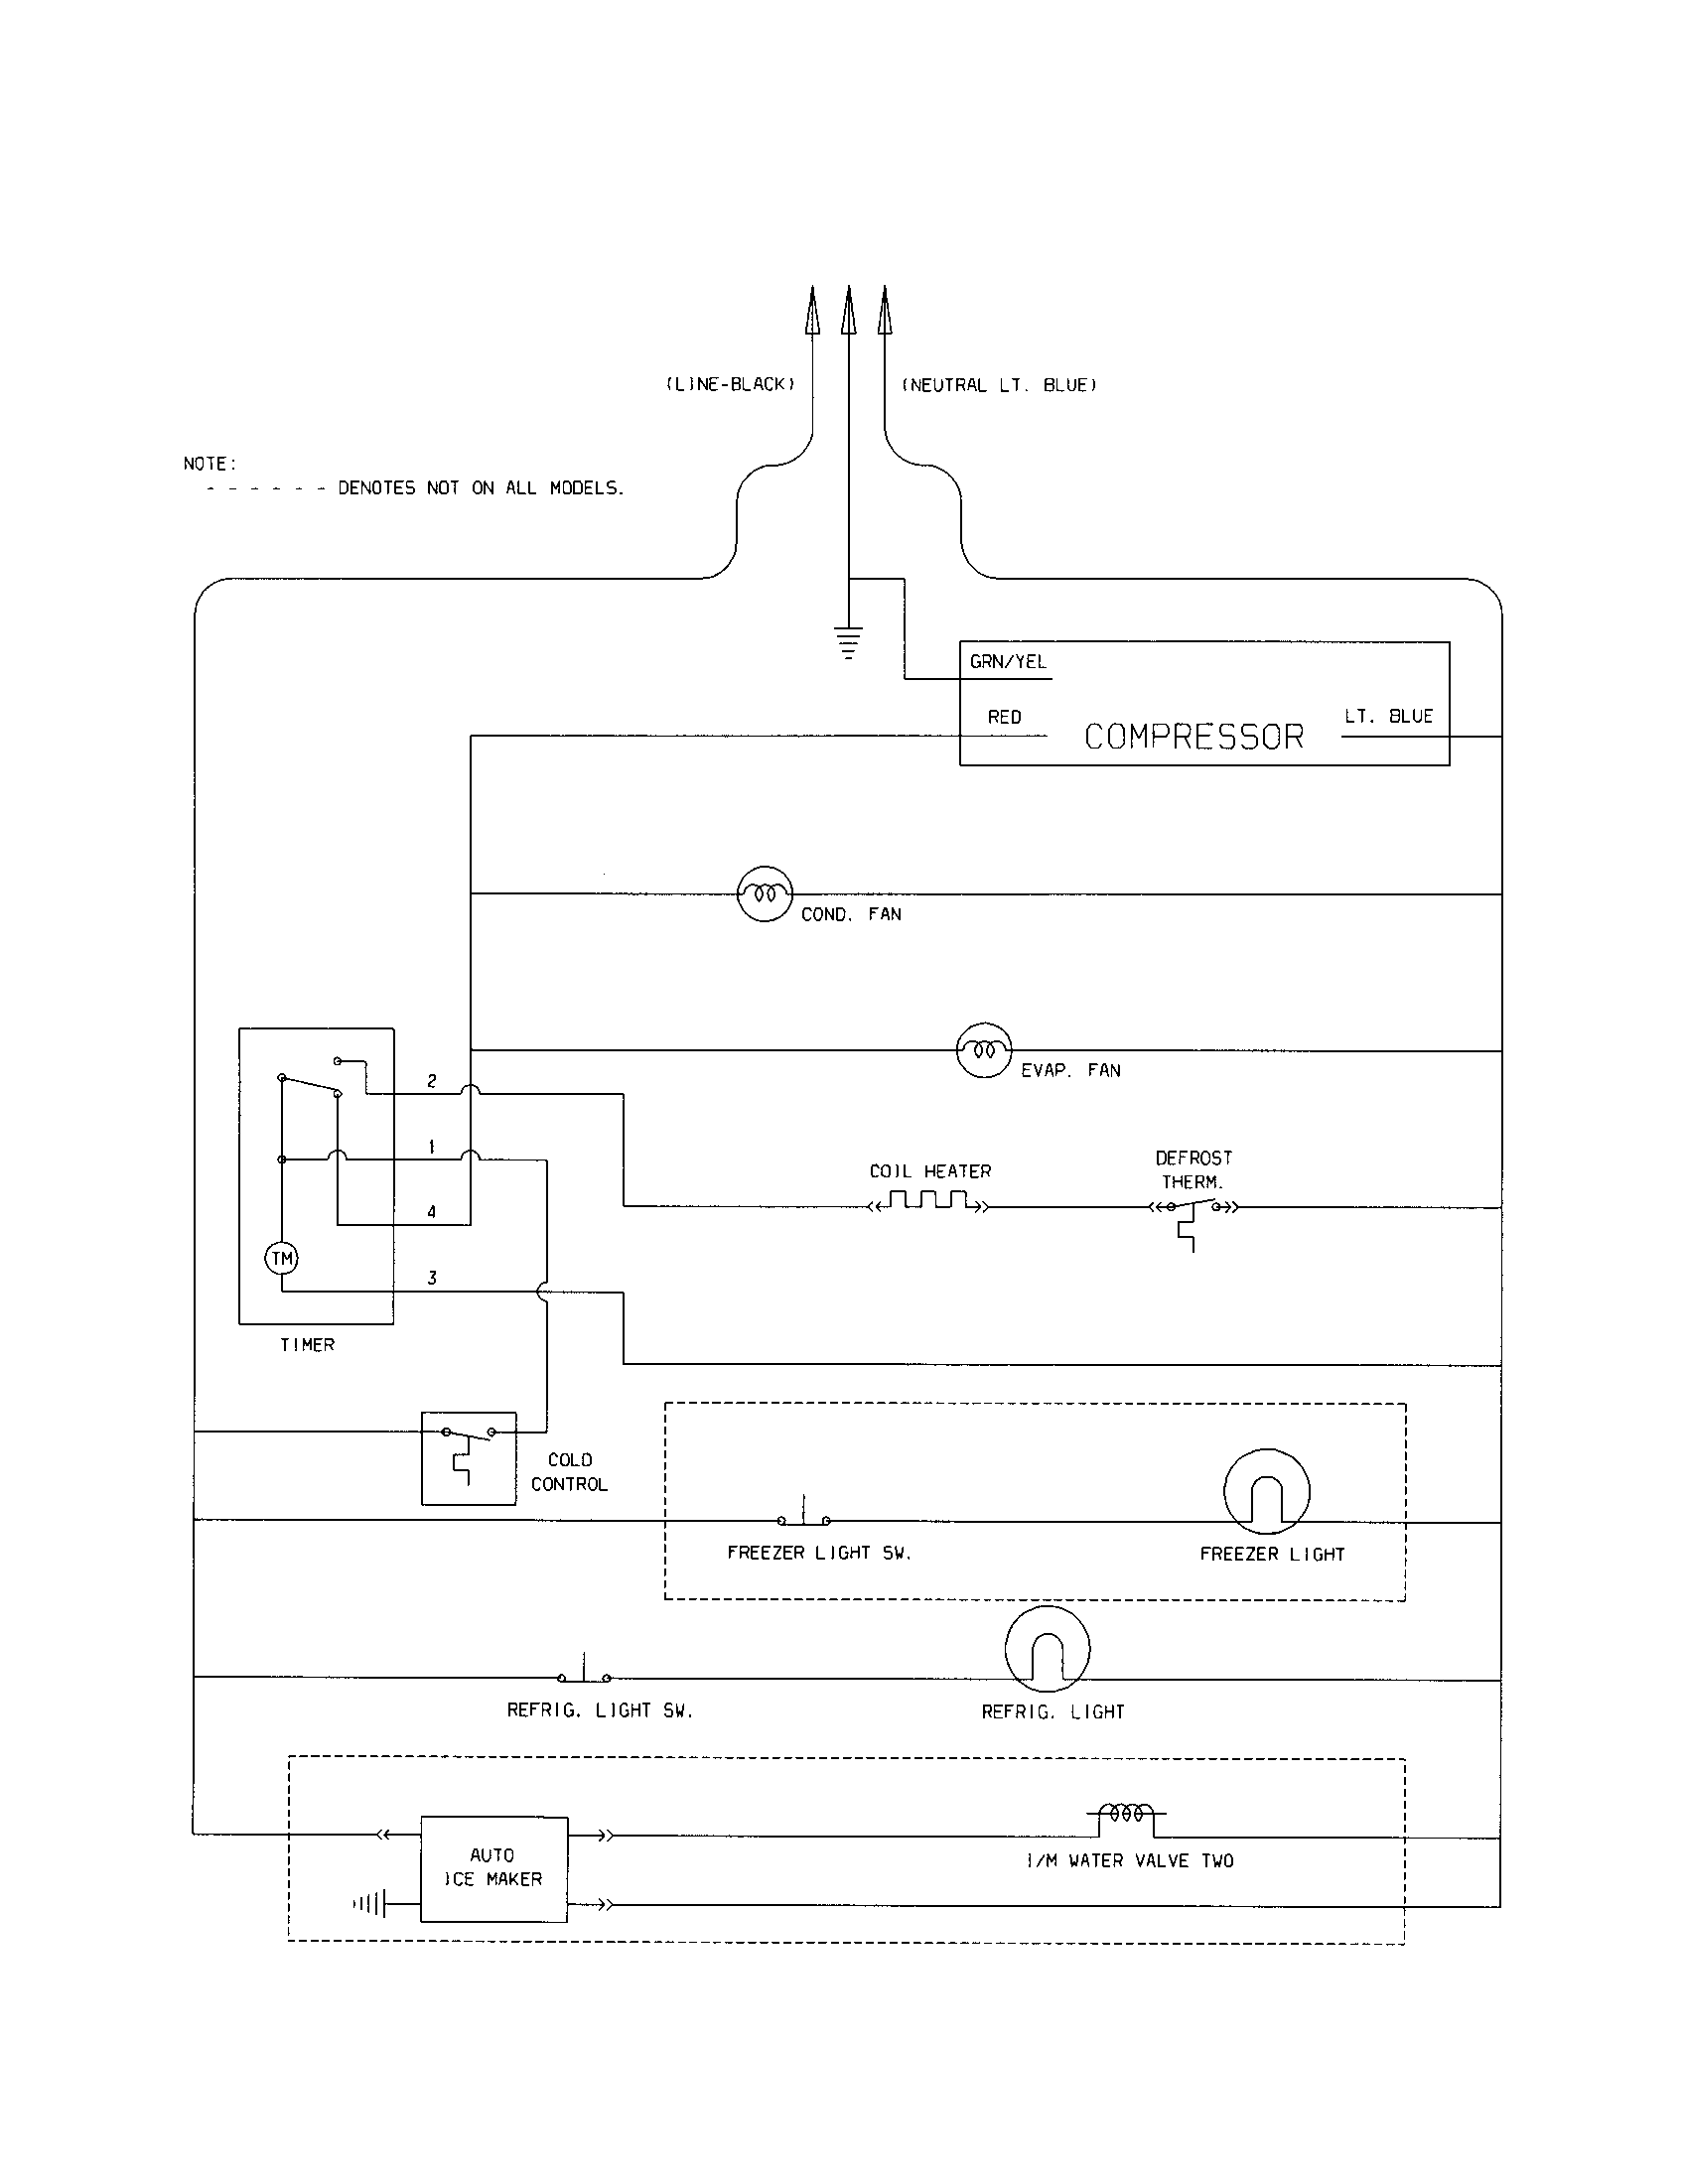 Kenmore 106 8566883 Wiring Diagram